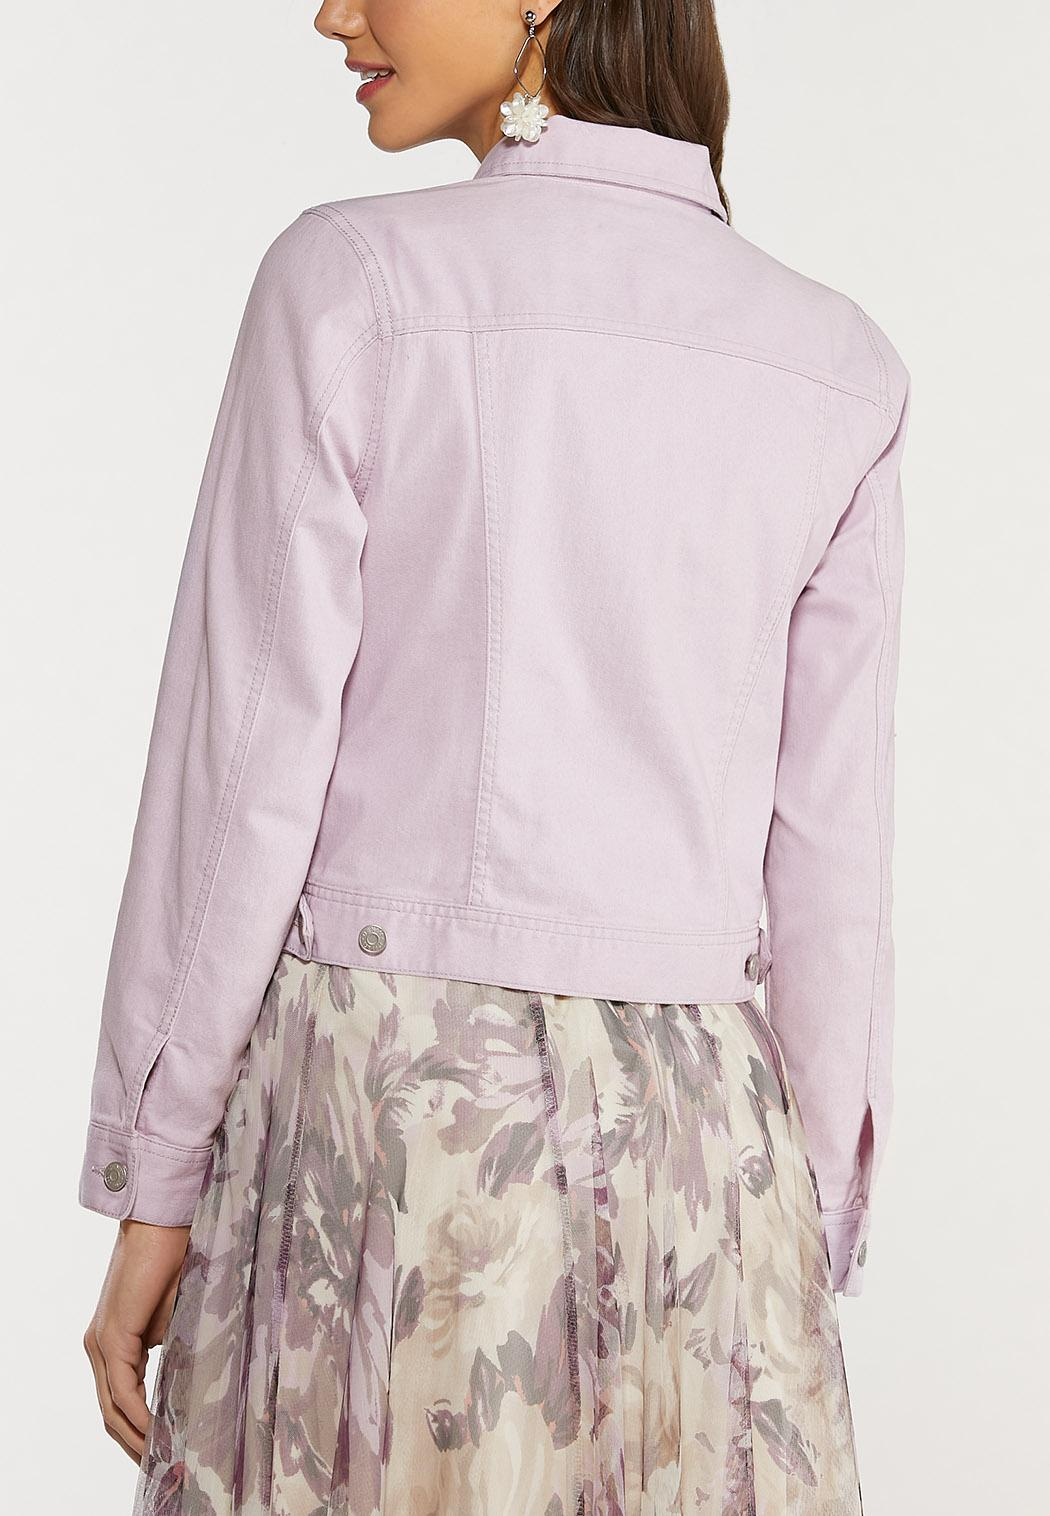 Plus Size Lavender Denim Jacket (Item #44473089)